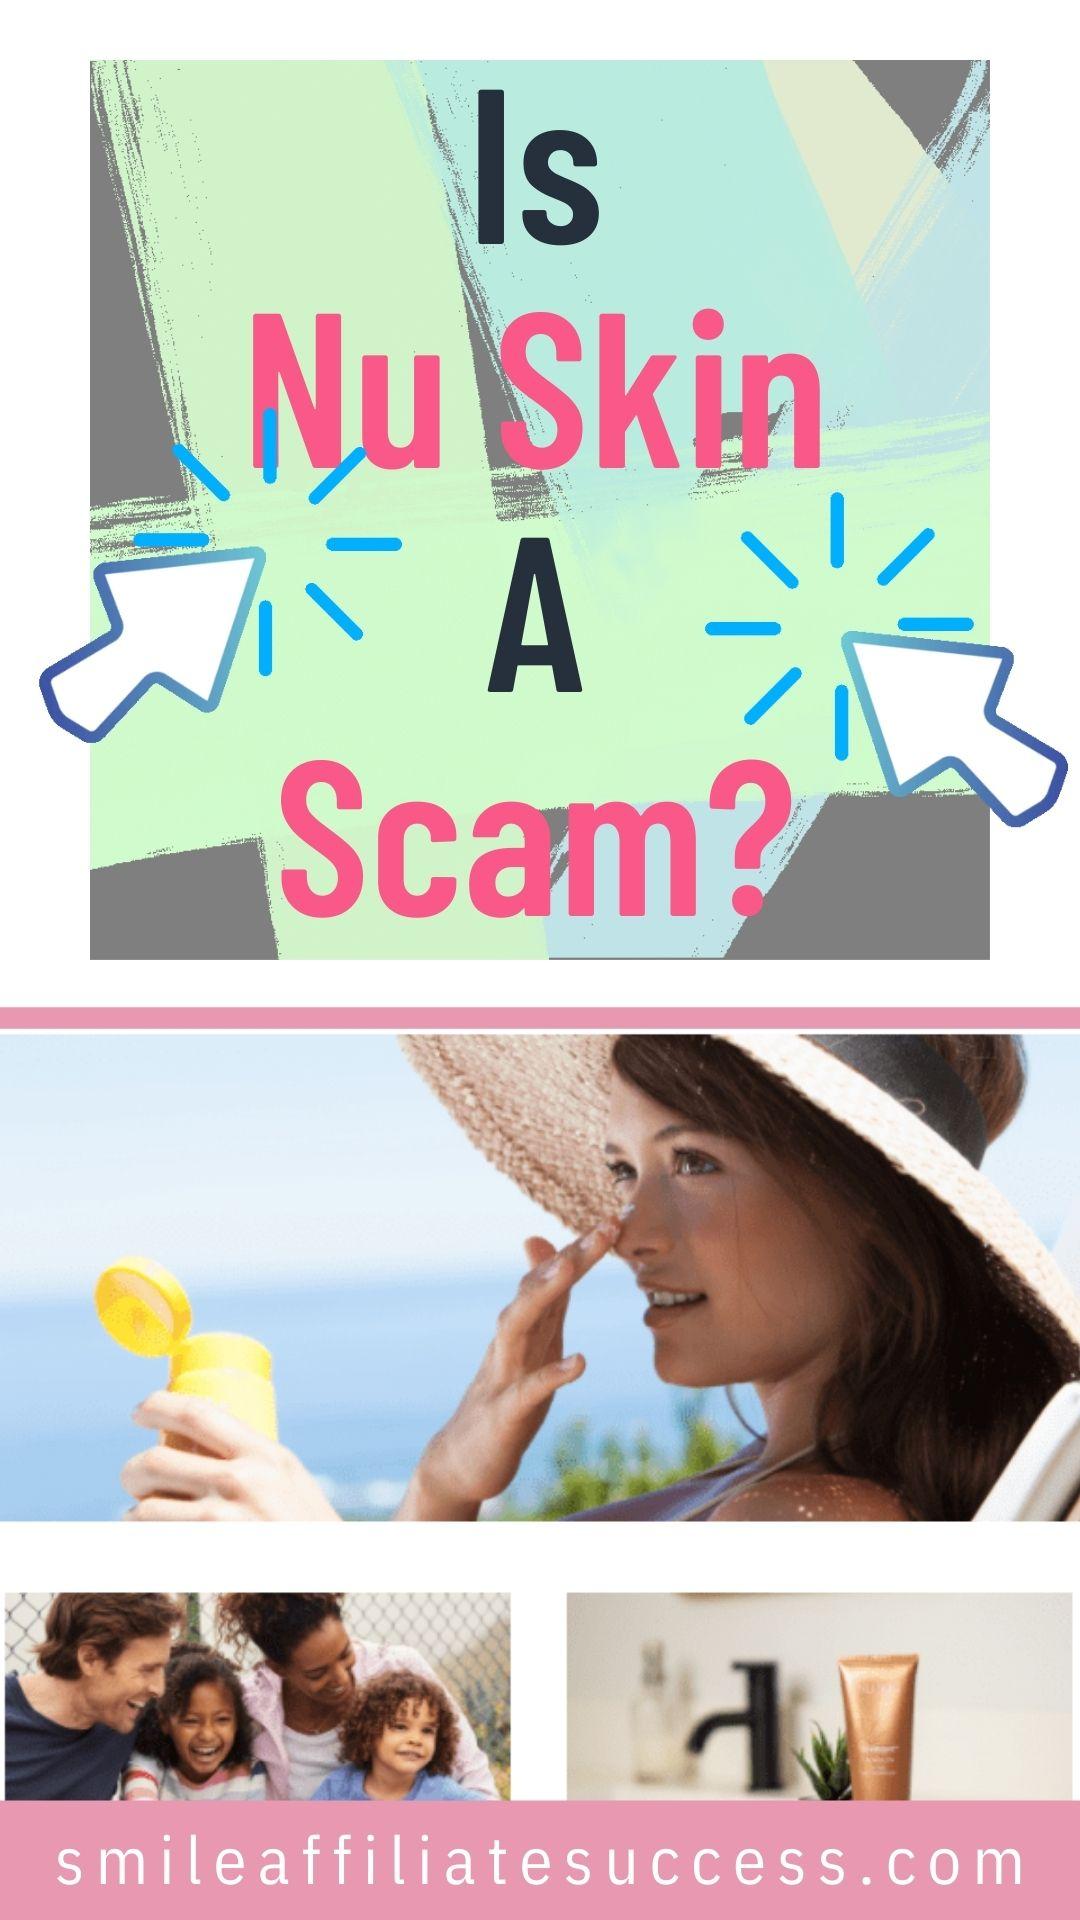 Is Nu Skin A Scam?